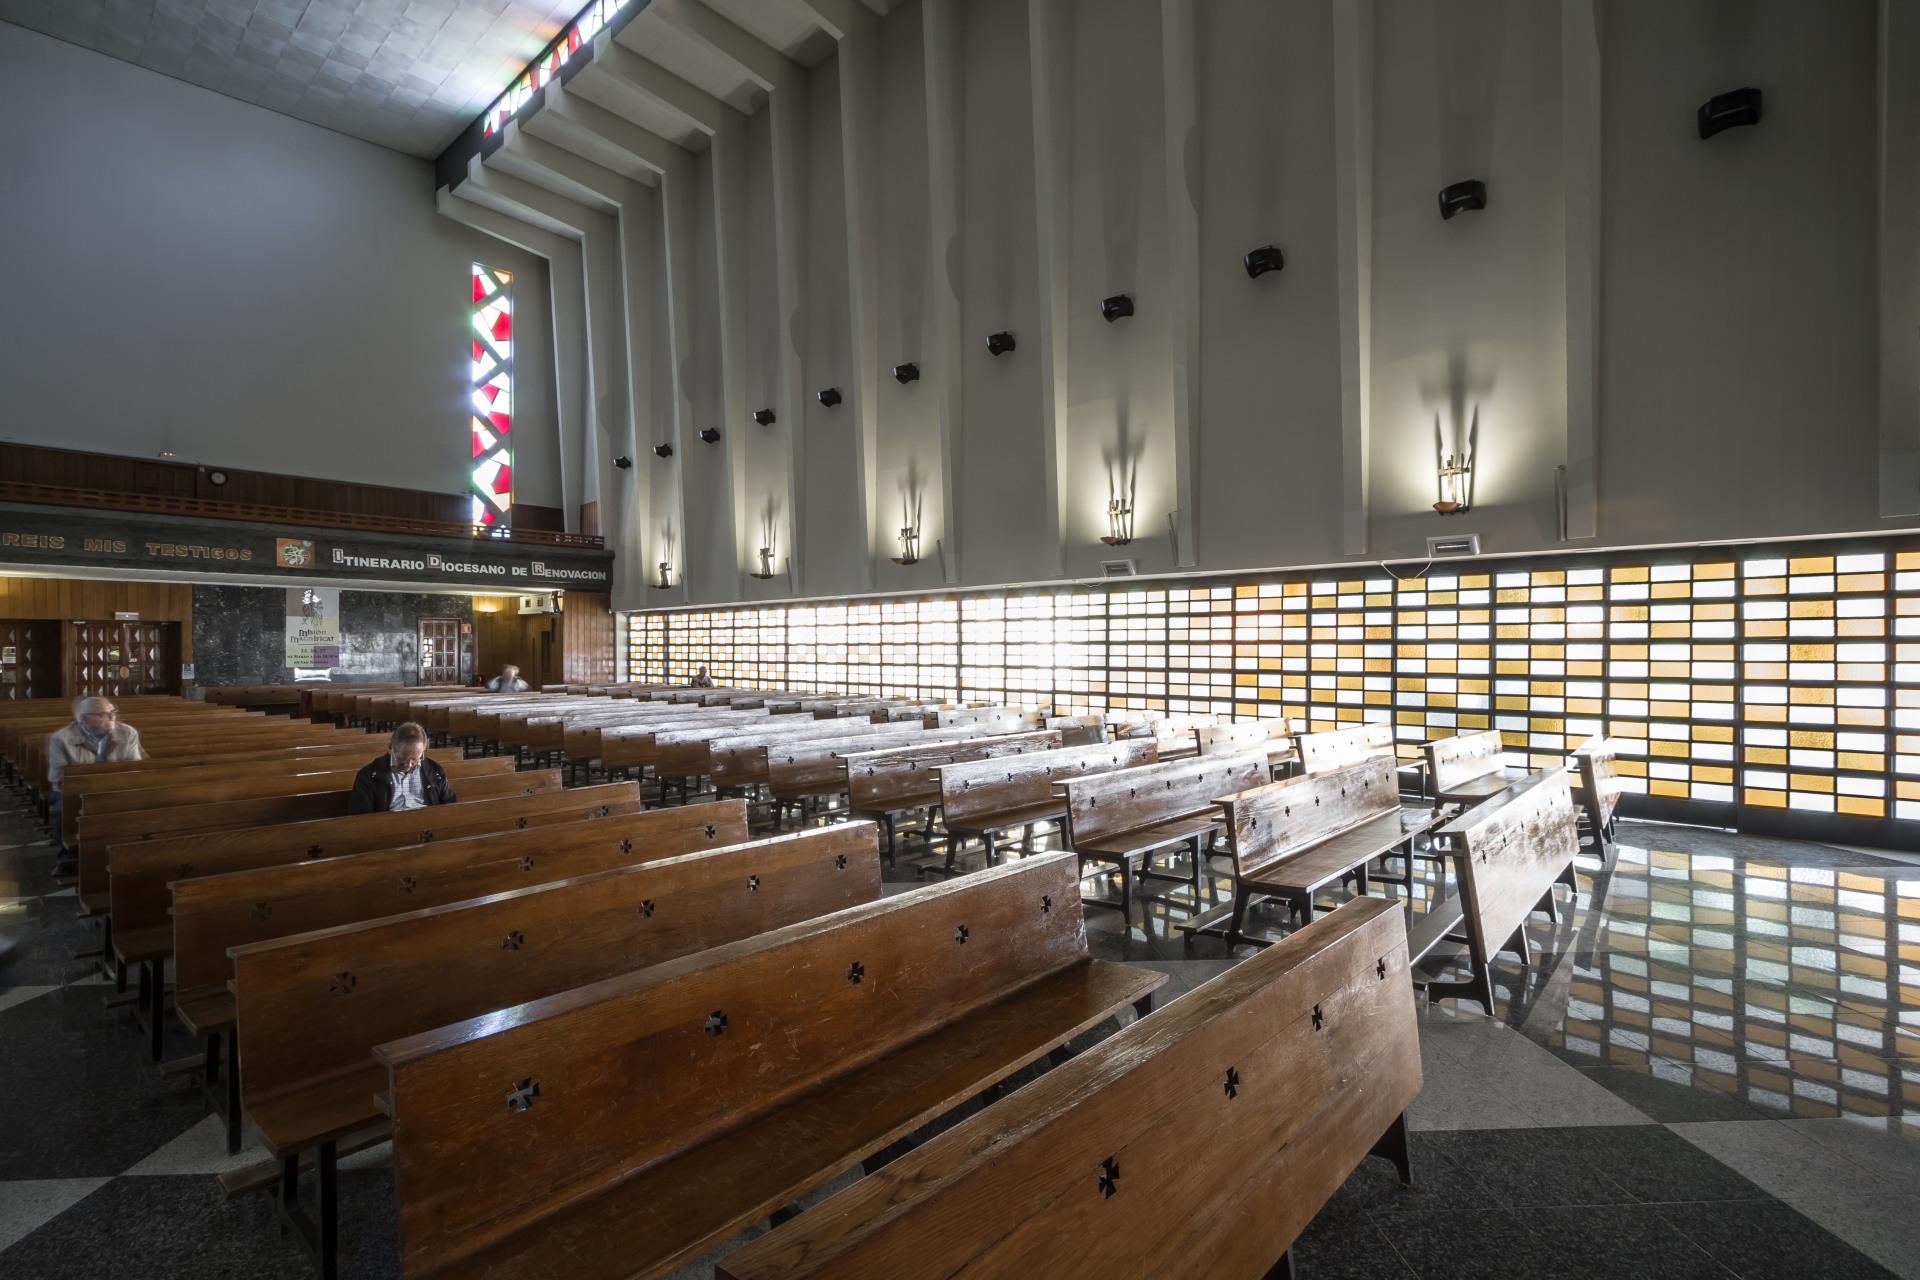 fotografia-arquitectura-valencia-gandia-german-cabo-iglesia-san-nicolas-torroja (9)